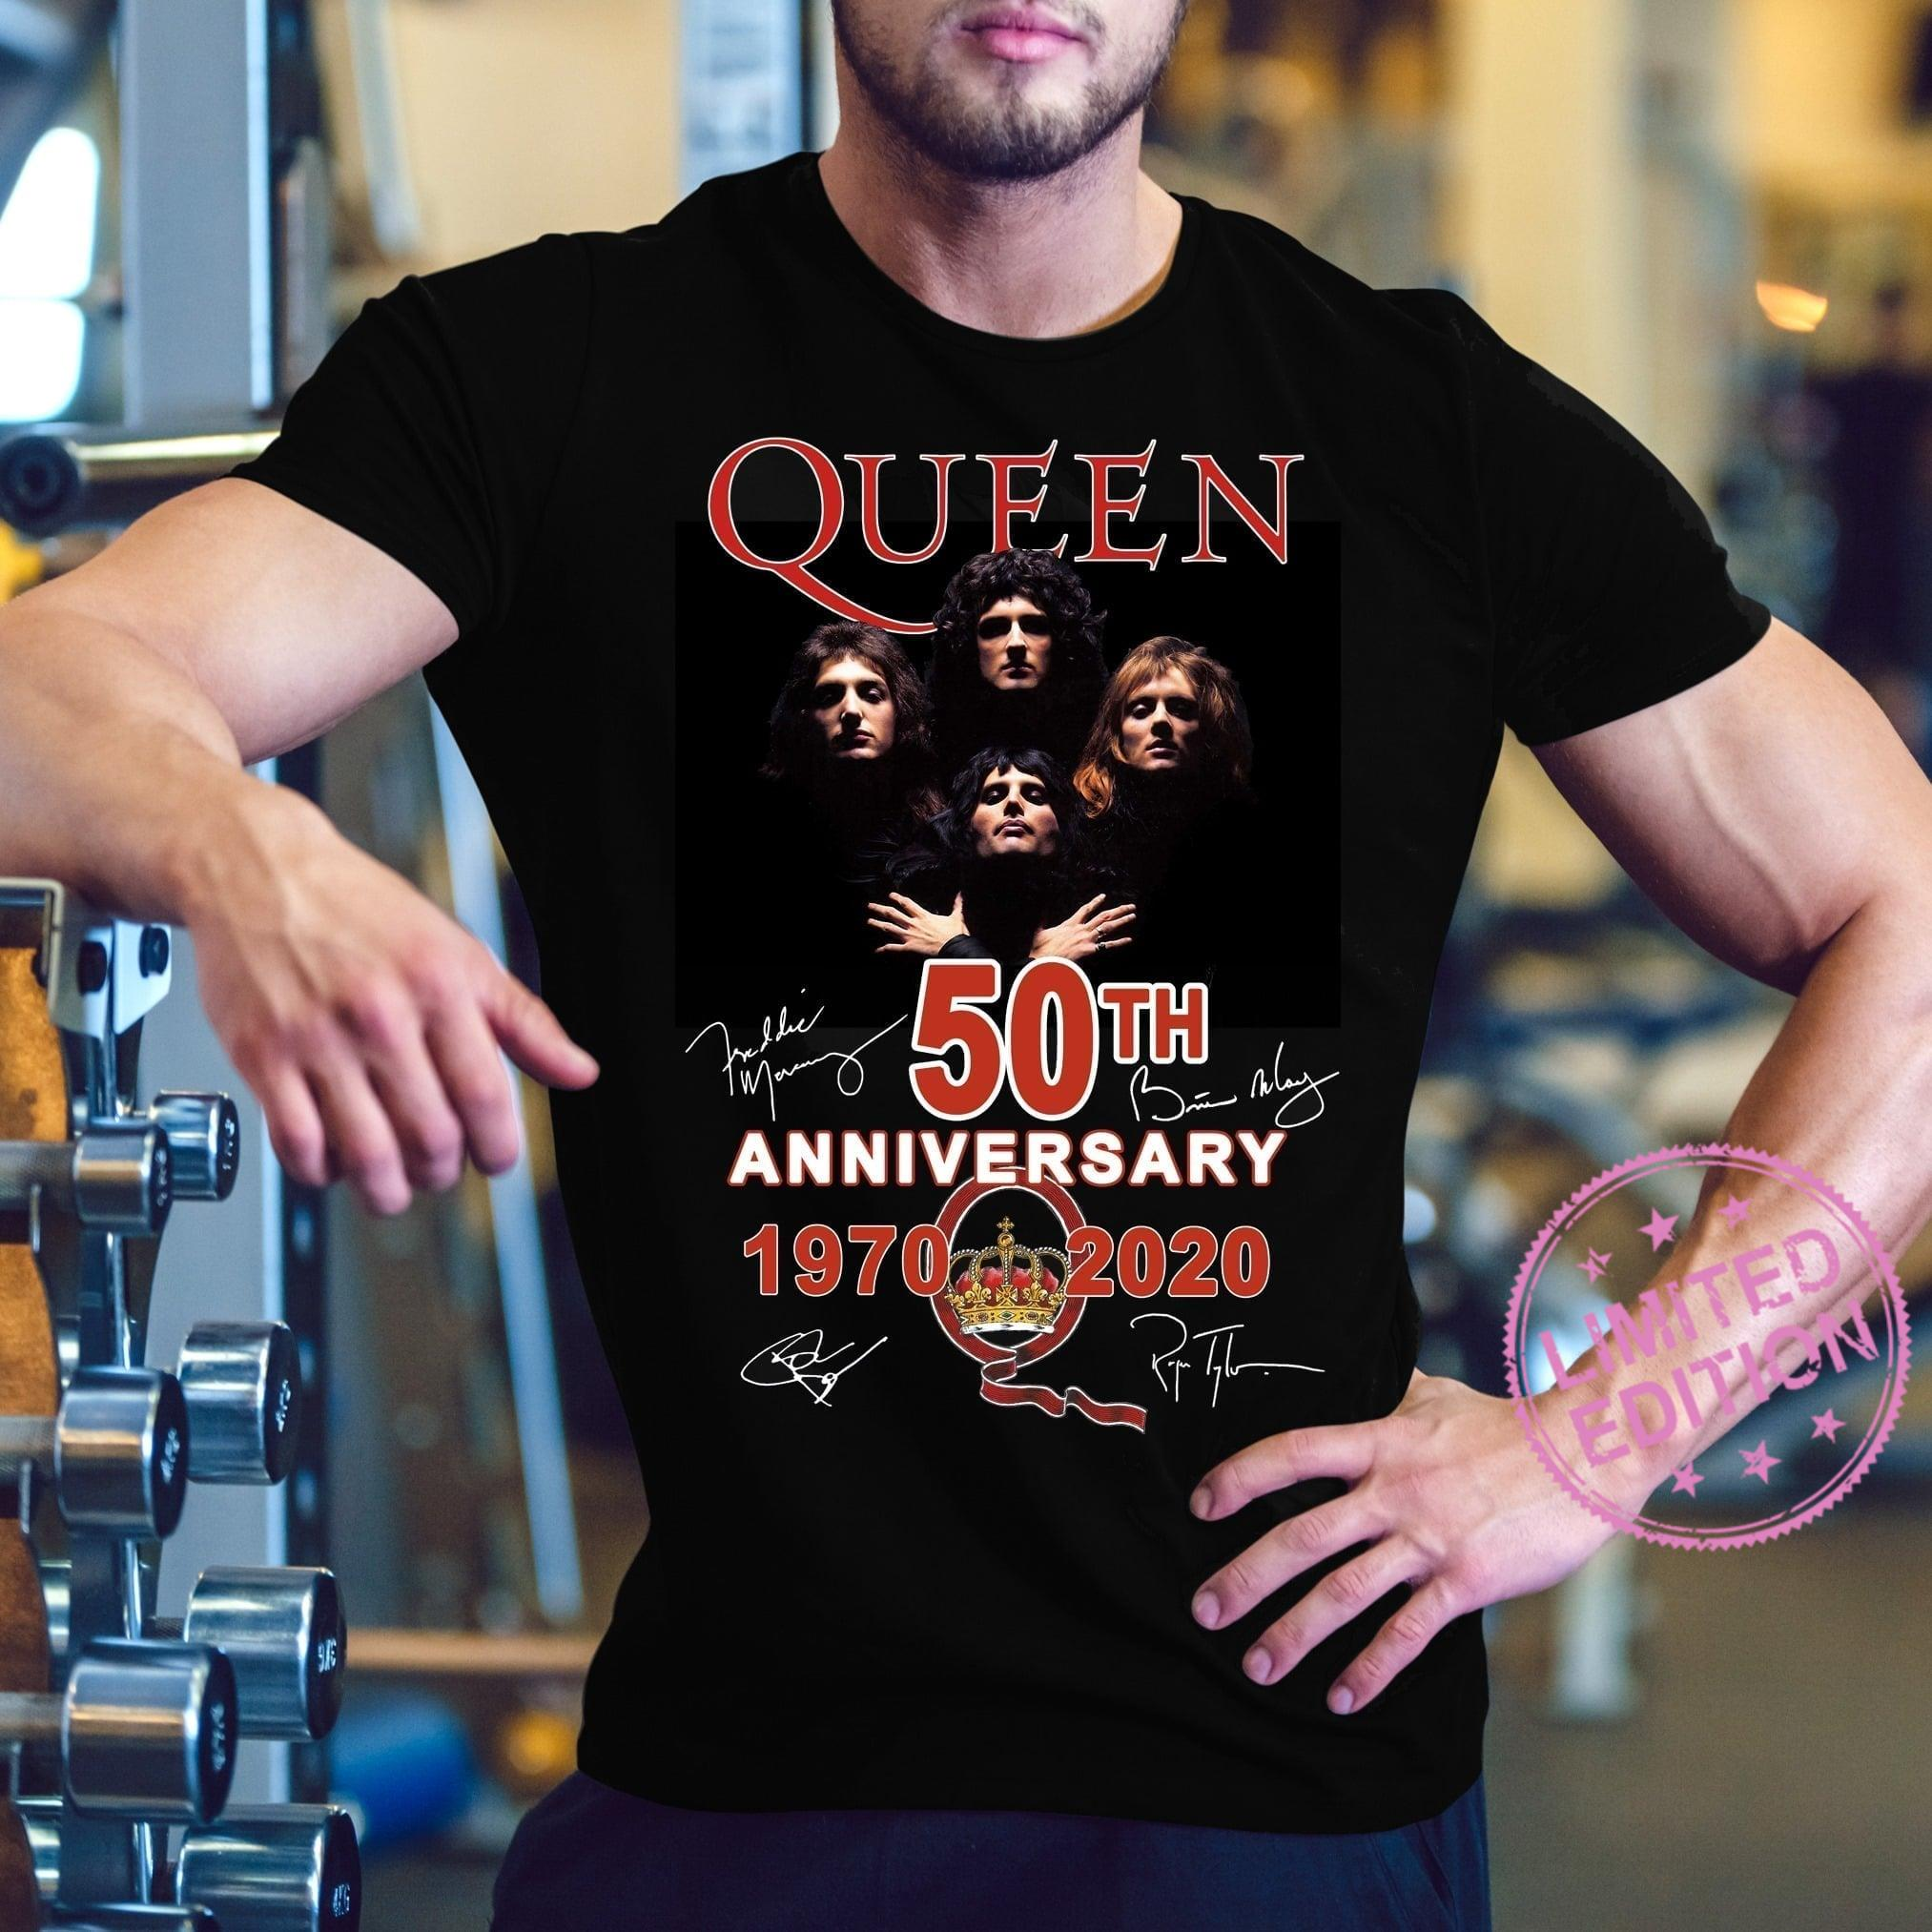 Queen 50th anniversary 1970 2020 shirt